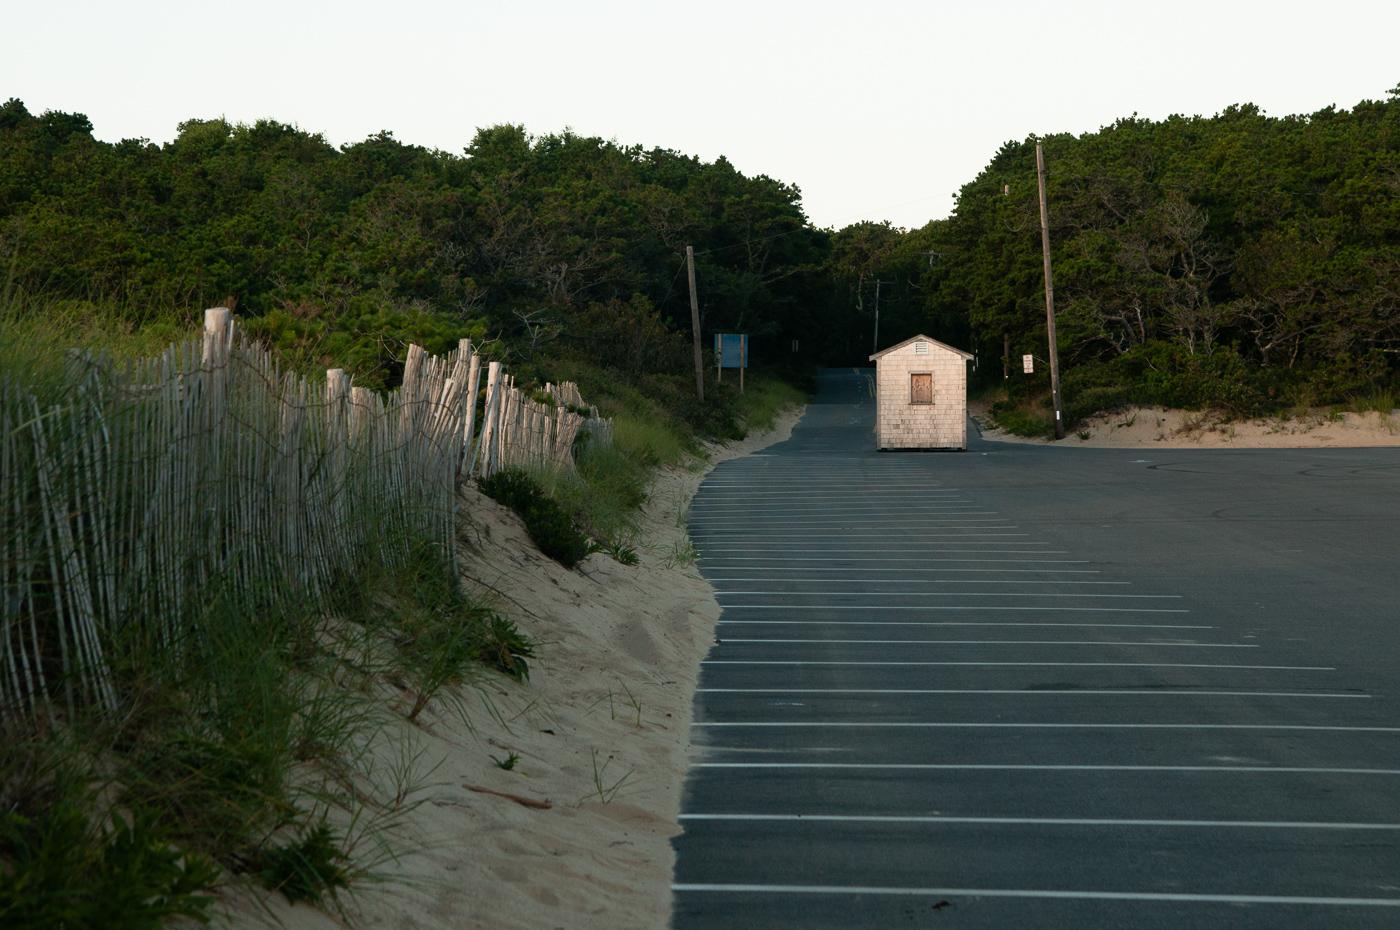 Morning Light on the Beach Hut